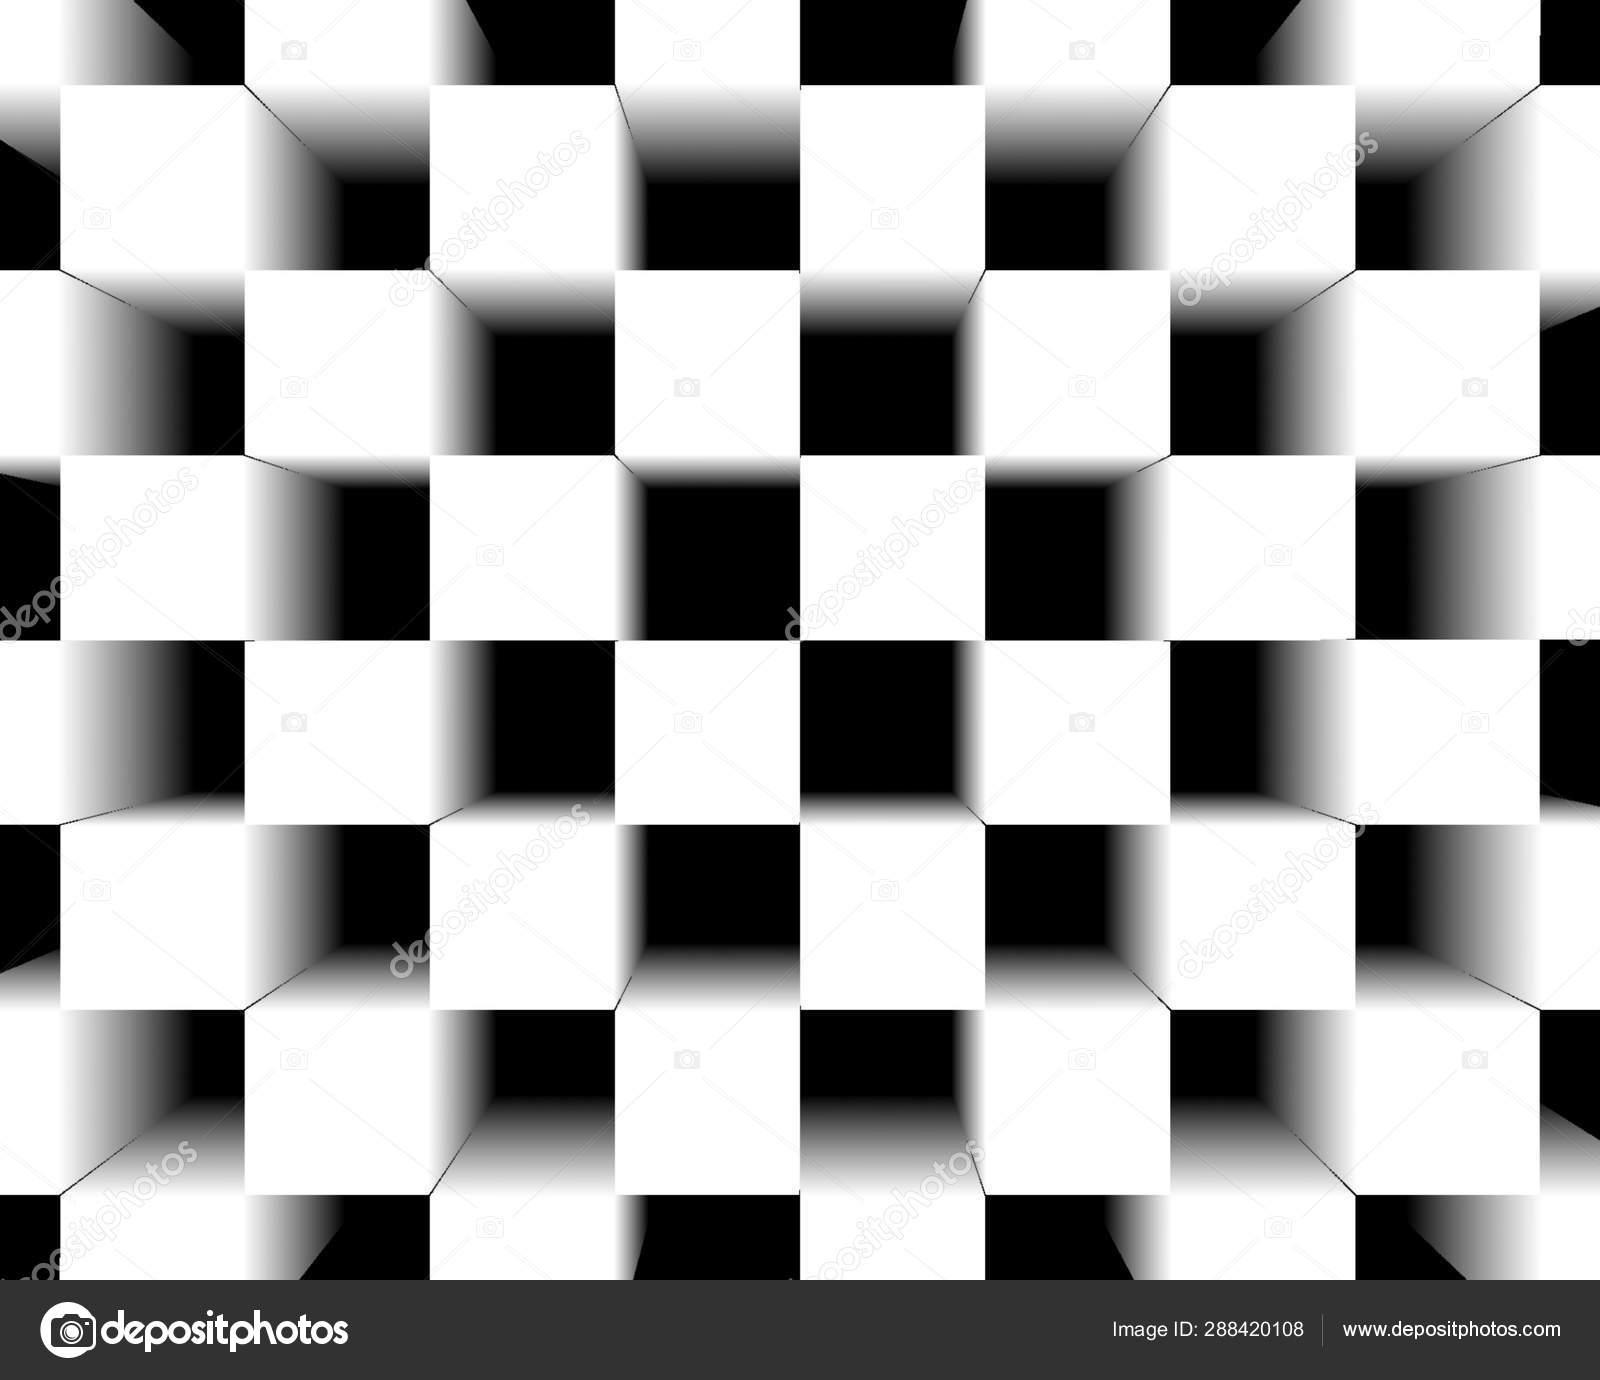 Black White Abstract Background Desktop Wallpaper Website Design Template Copy Stock Photo C Tza X Hotmail Com 288420108